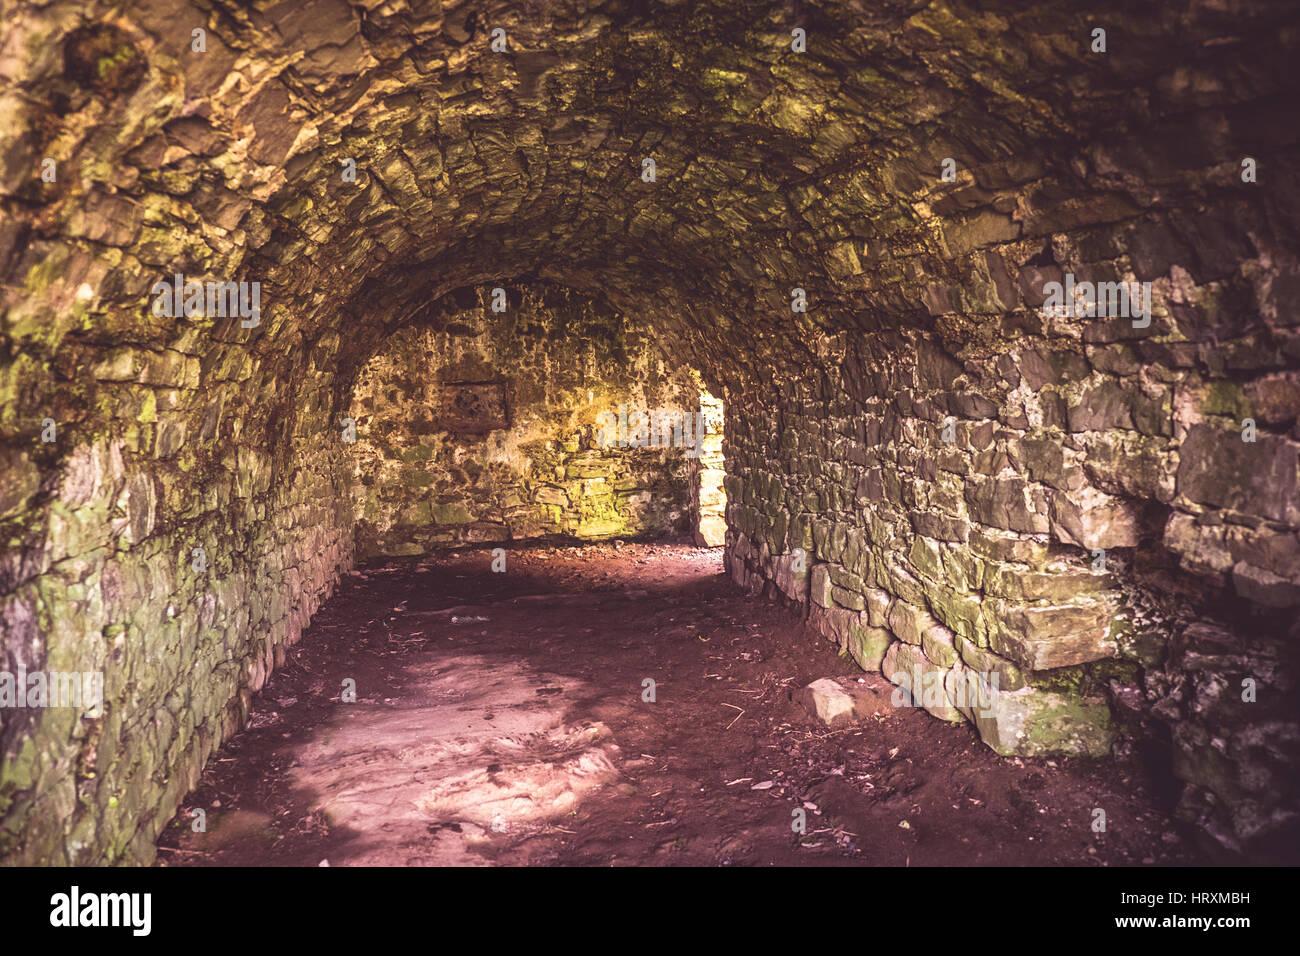 Castle interiors - Stock Image